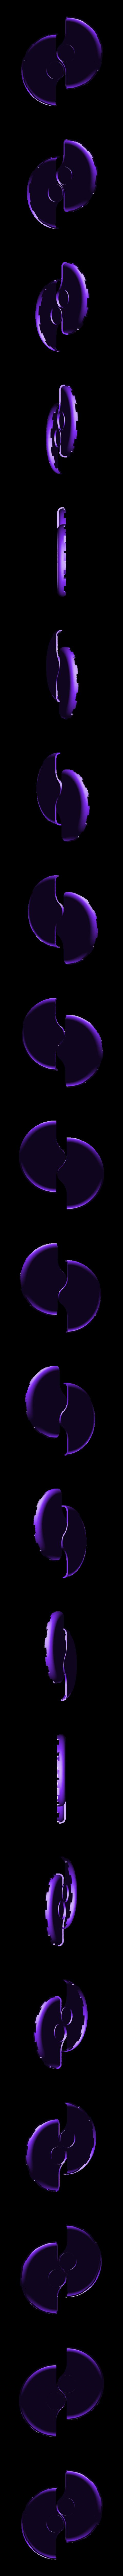 spinner_holder_half.stl Download free STL file Spinner Holder • 3D printable template, CyberCyclist